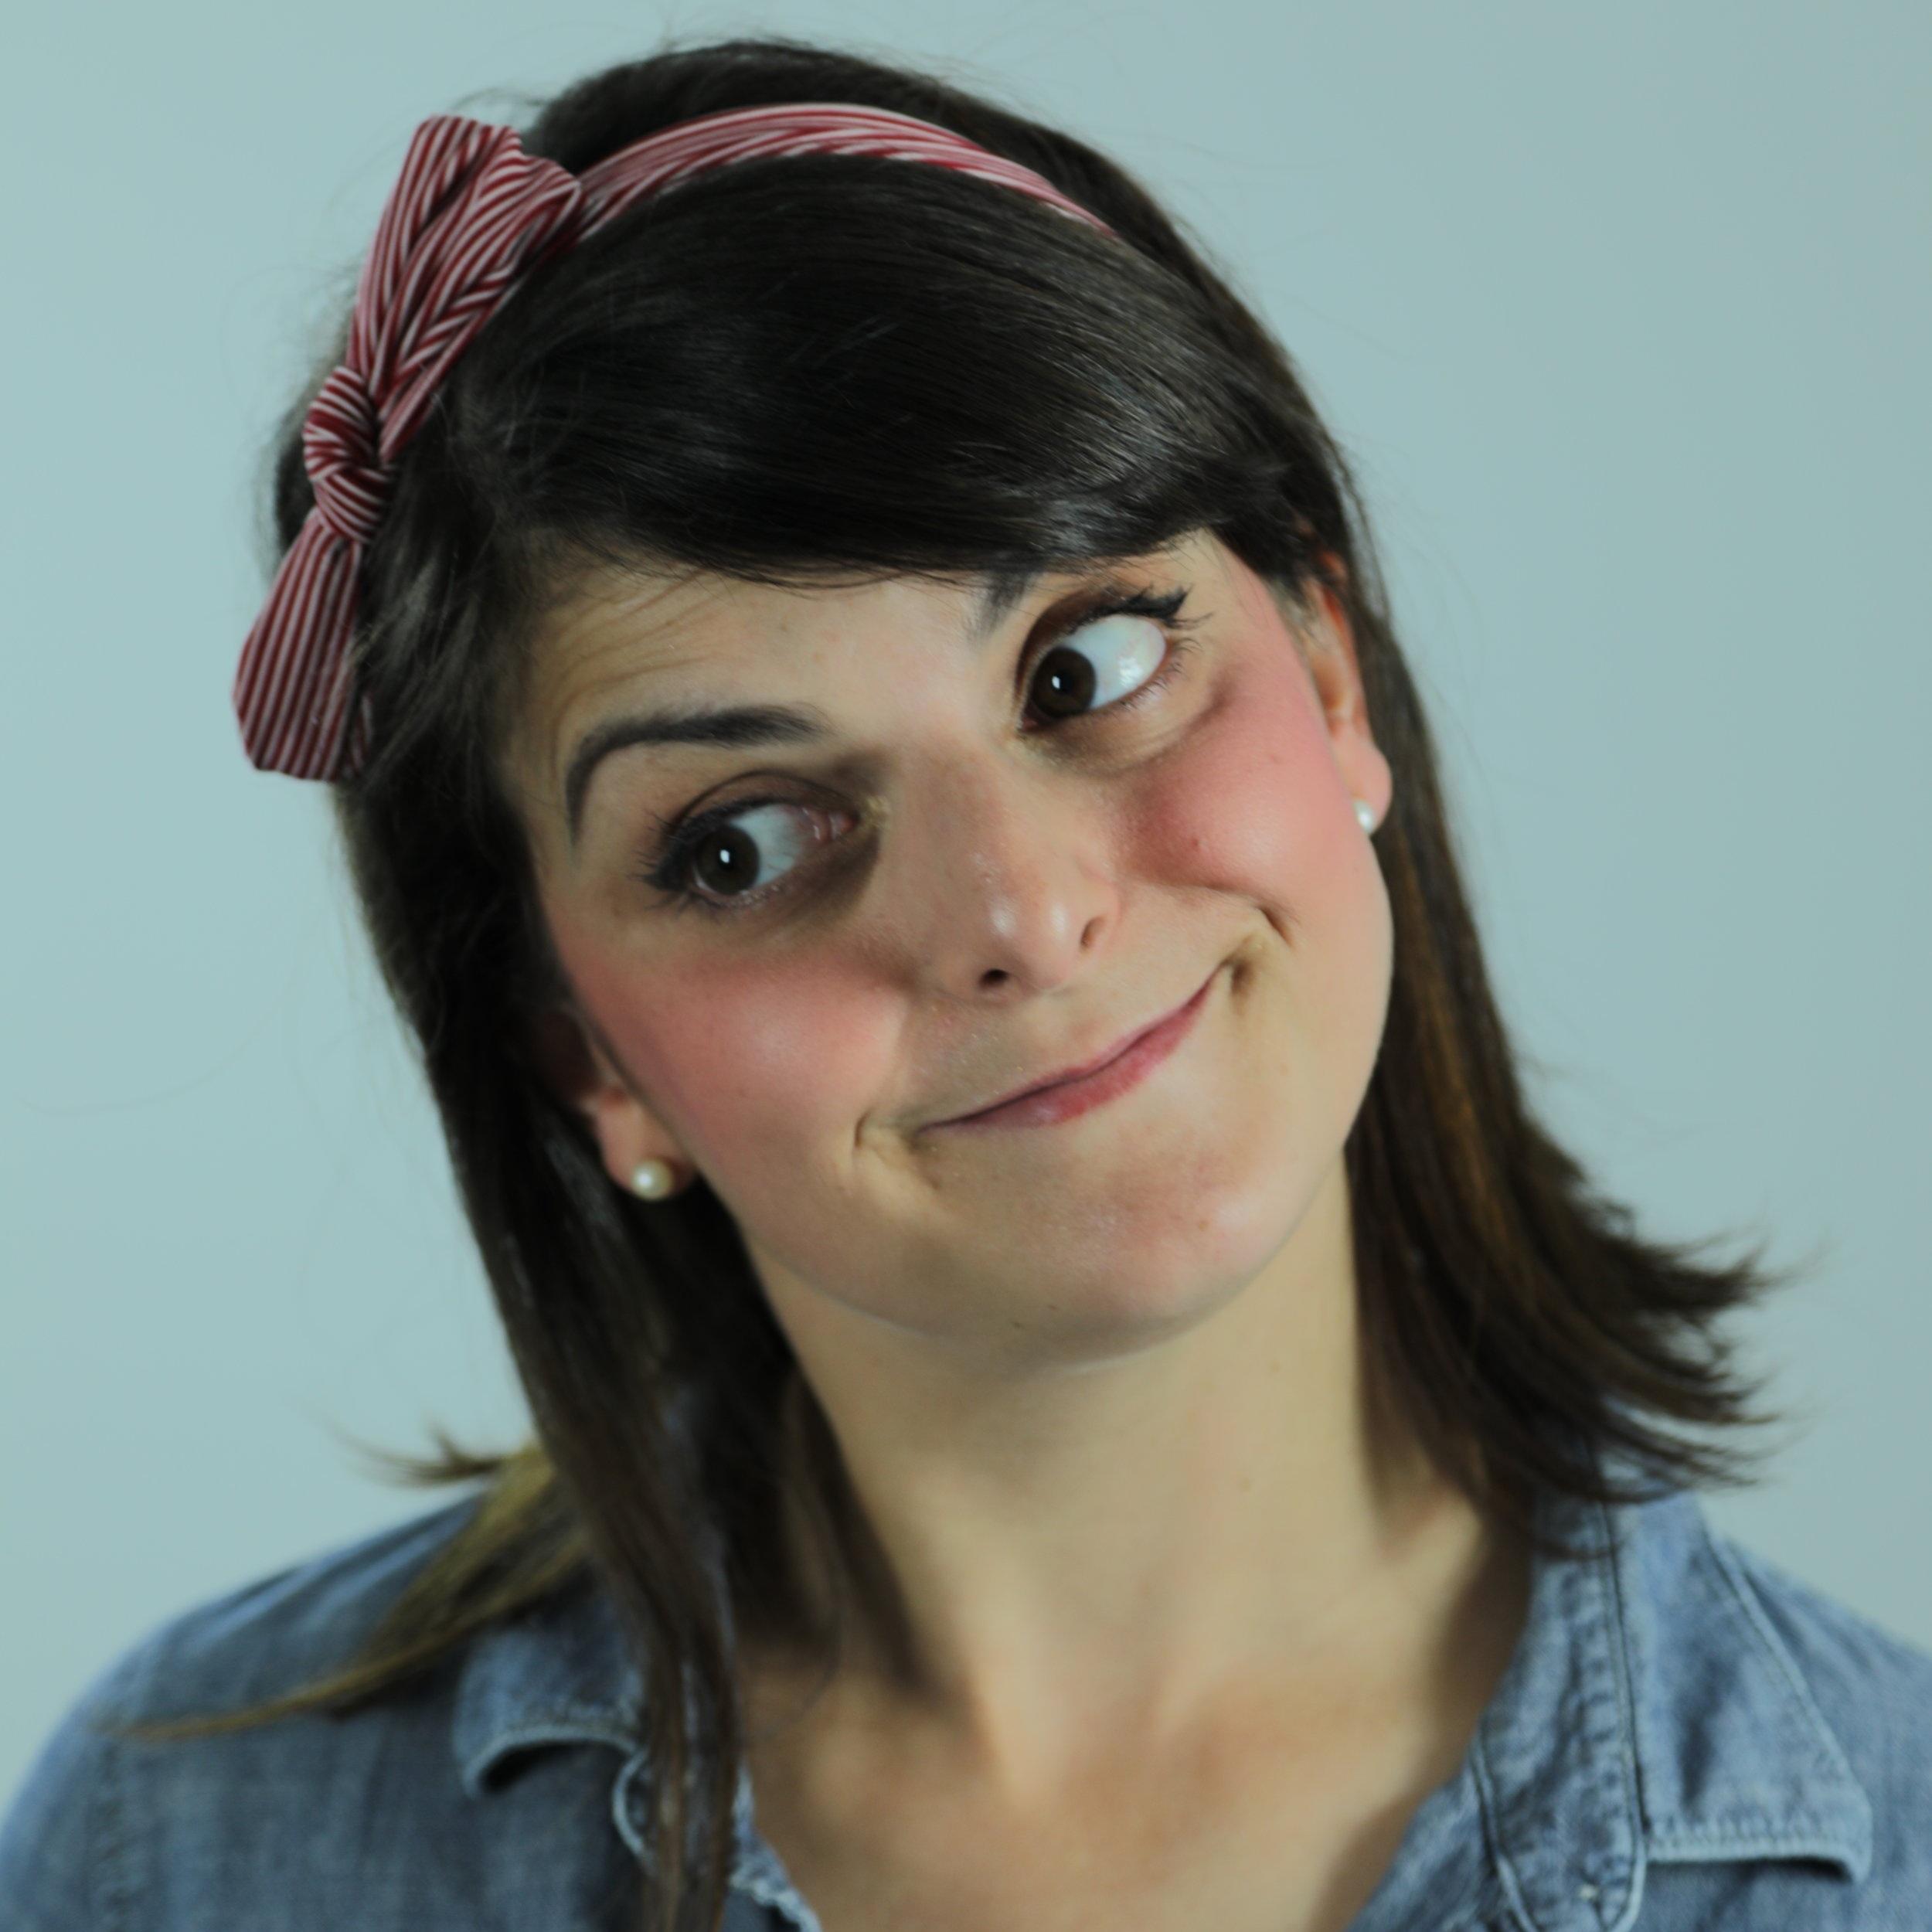 Victoria Frangoulis